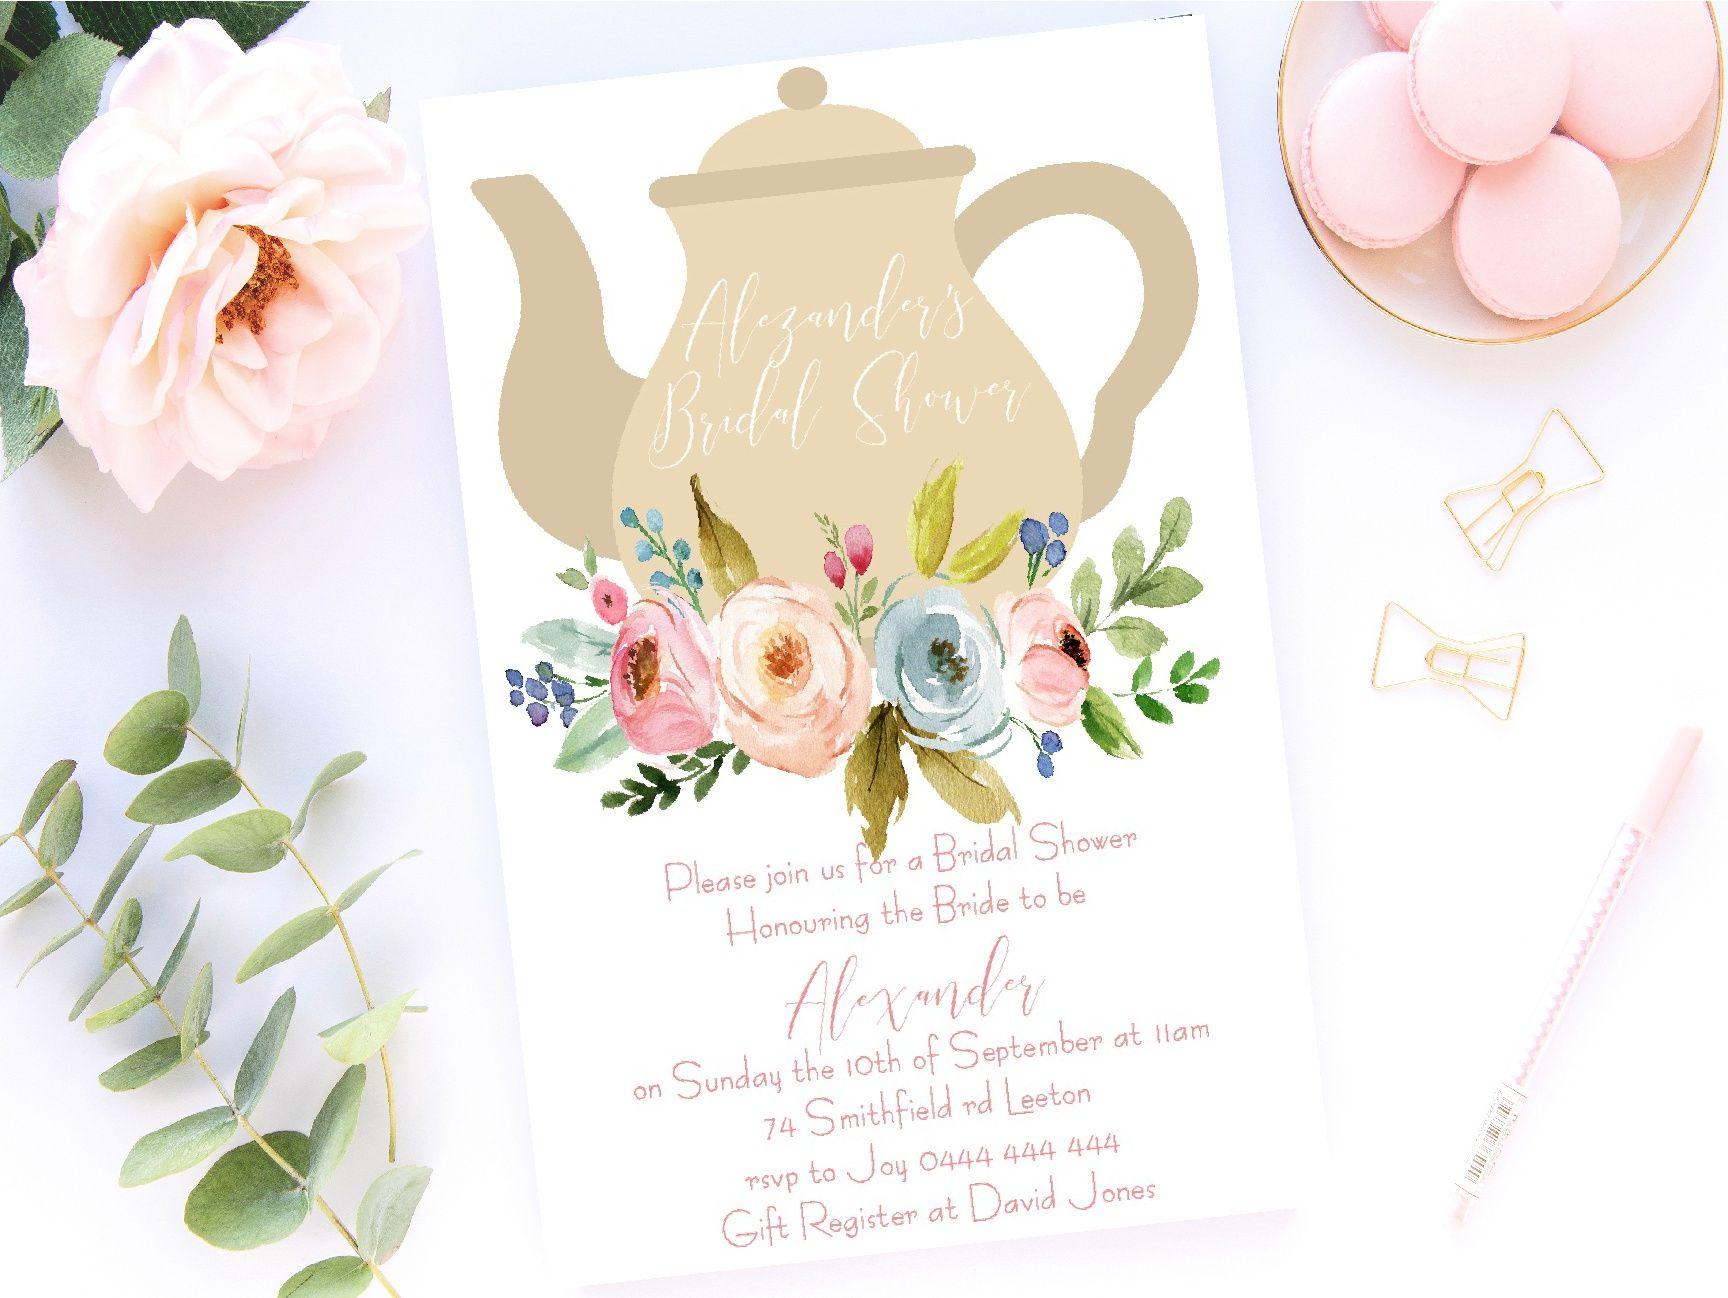 BRIDAL SHOWER KITCHEN TEA BRIDE TO BE TEAPOT